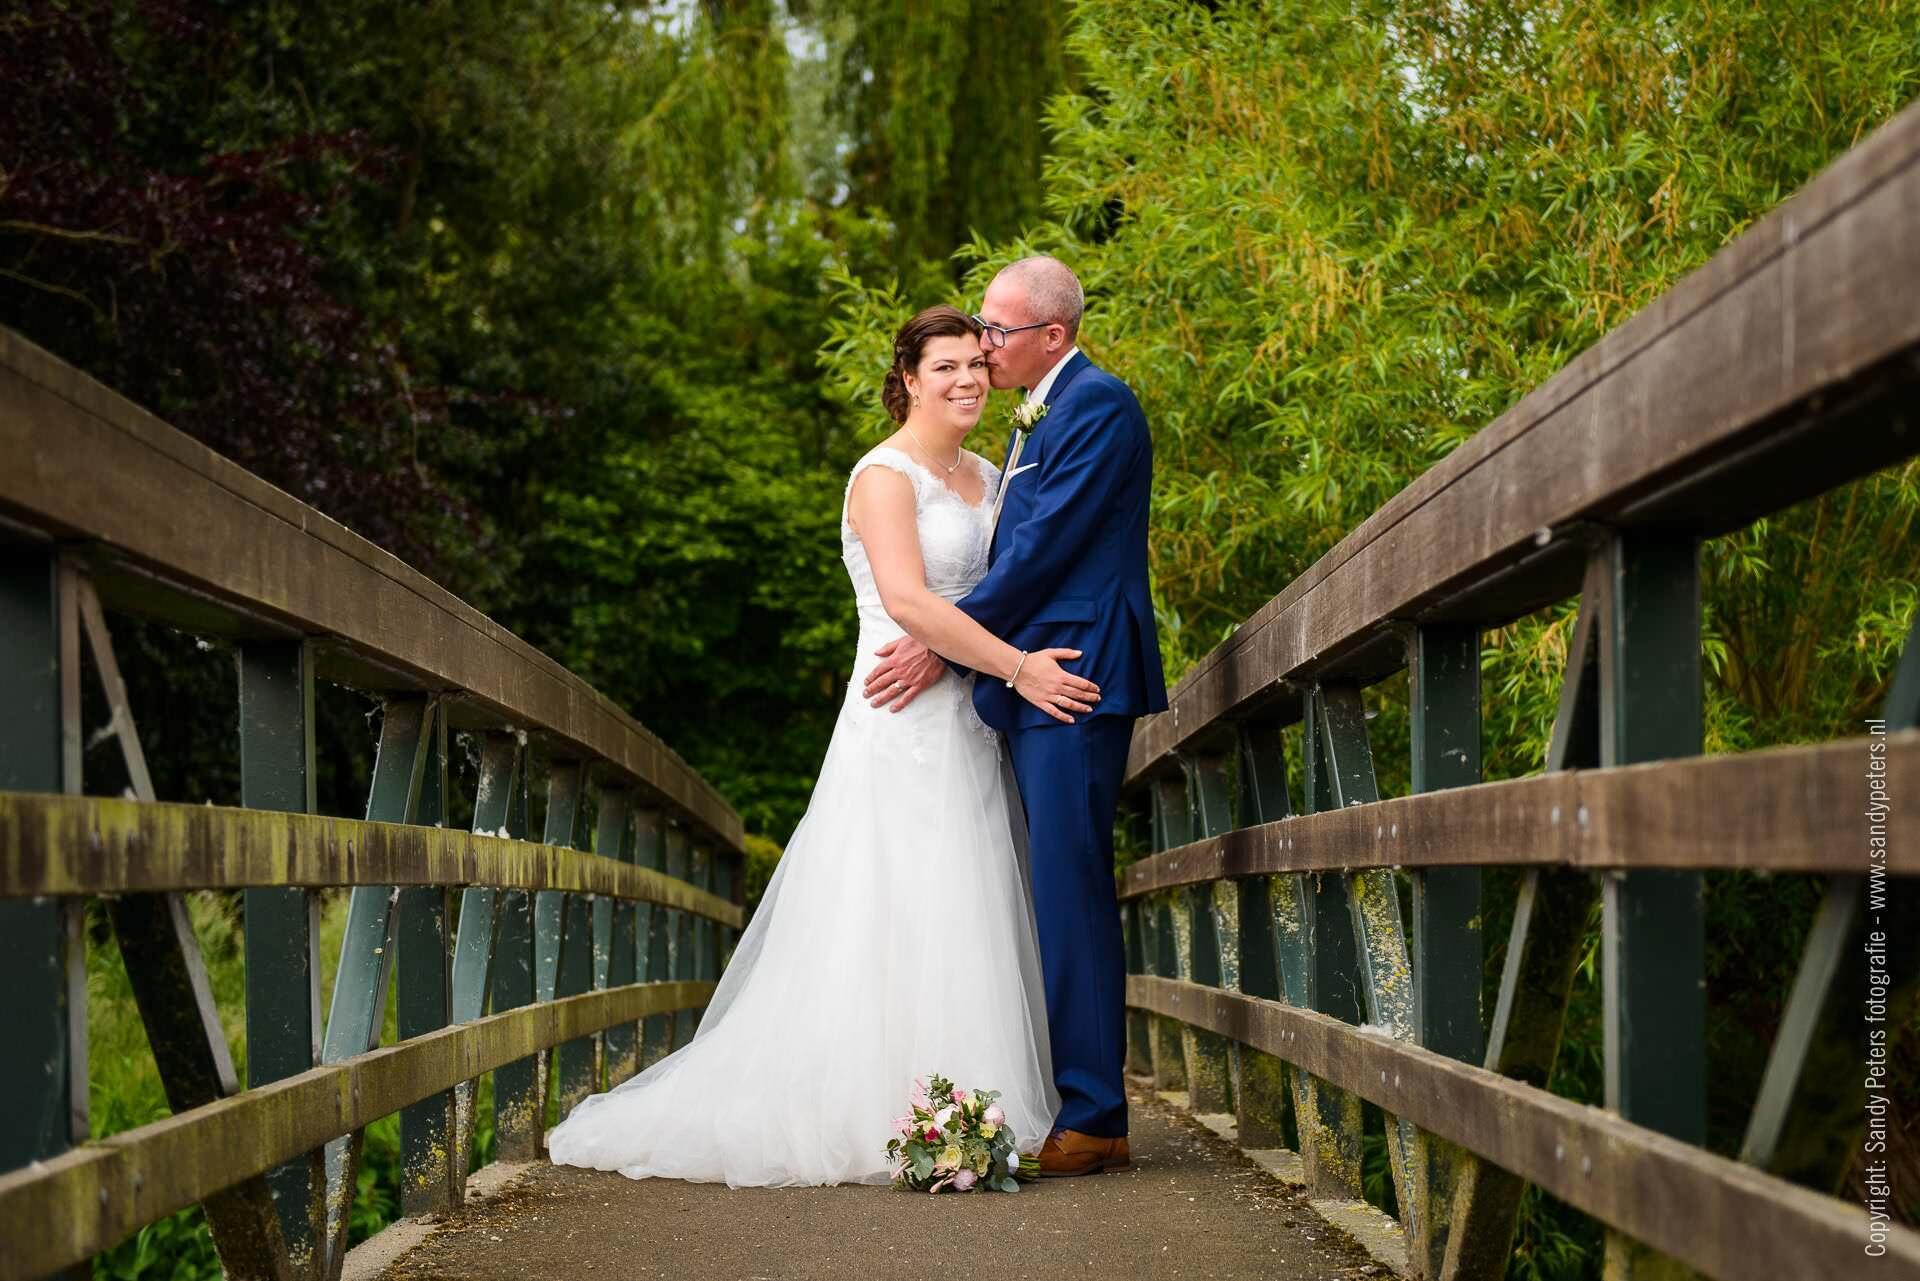 Bruiloft in Keldonk (Erp) en Son bij Lasonnerie en park Vroonhoven